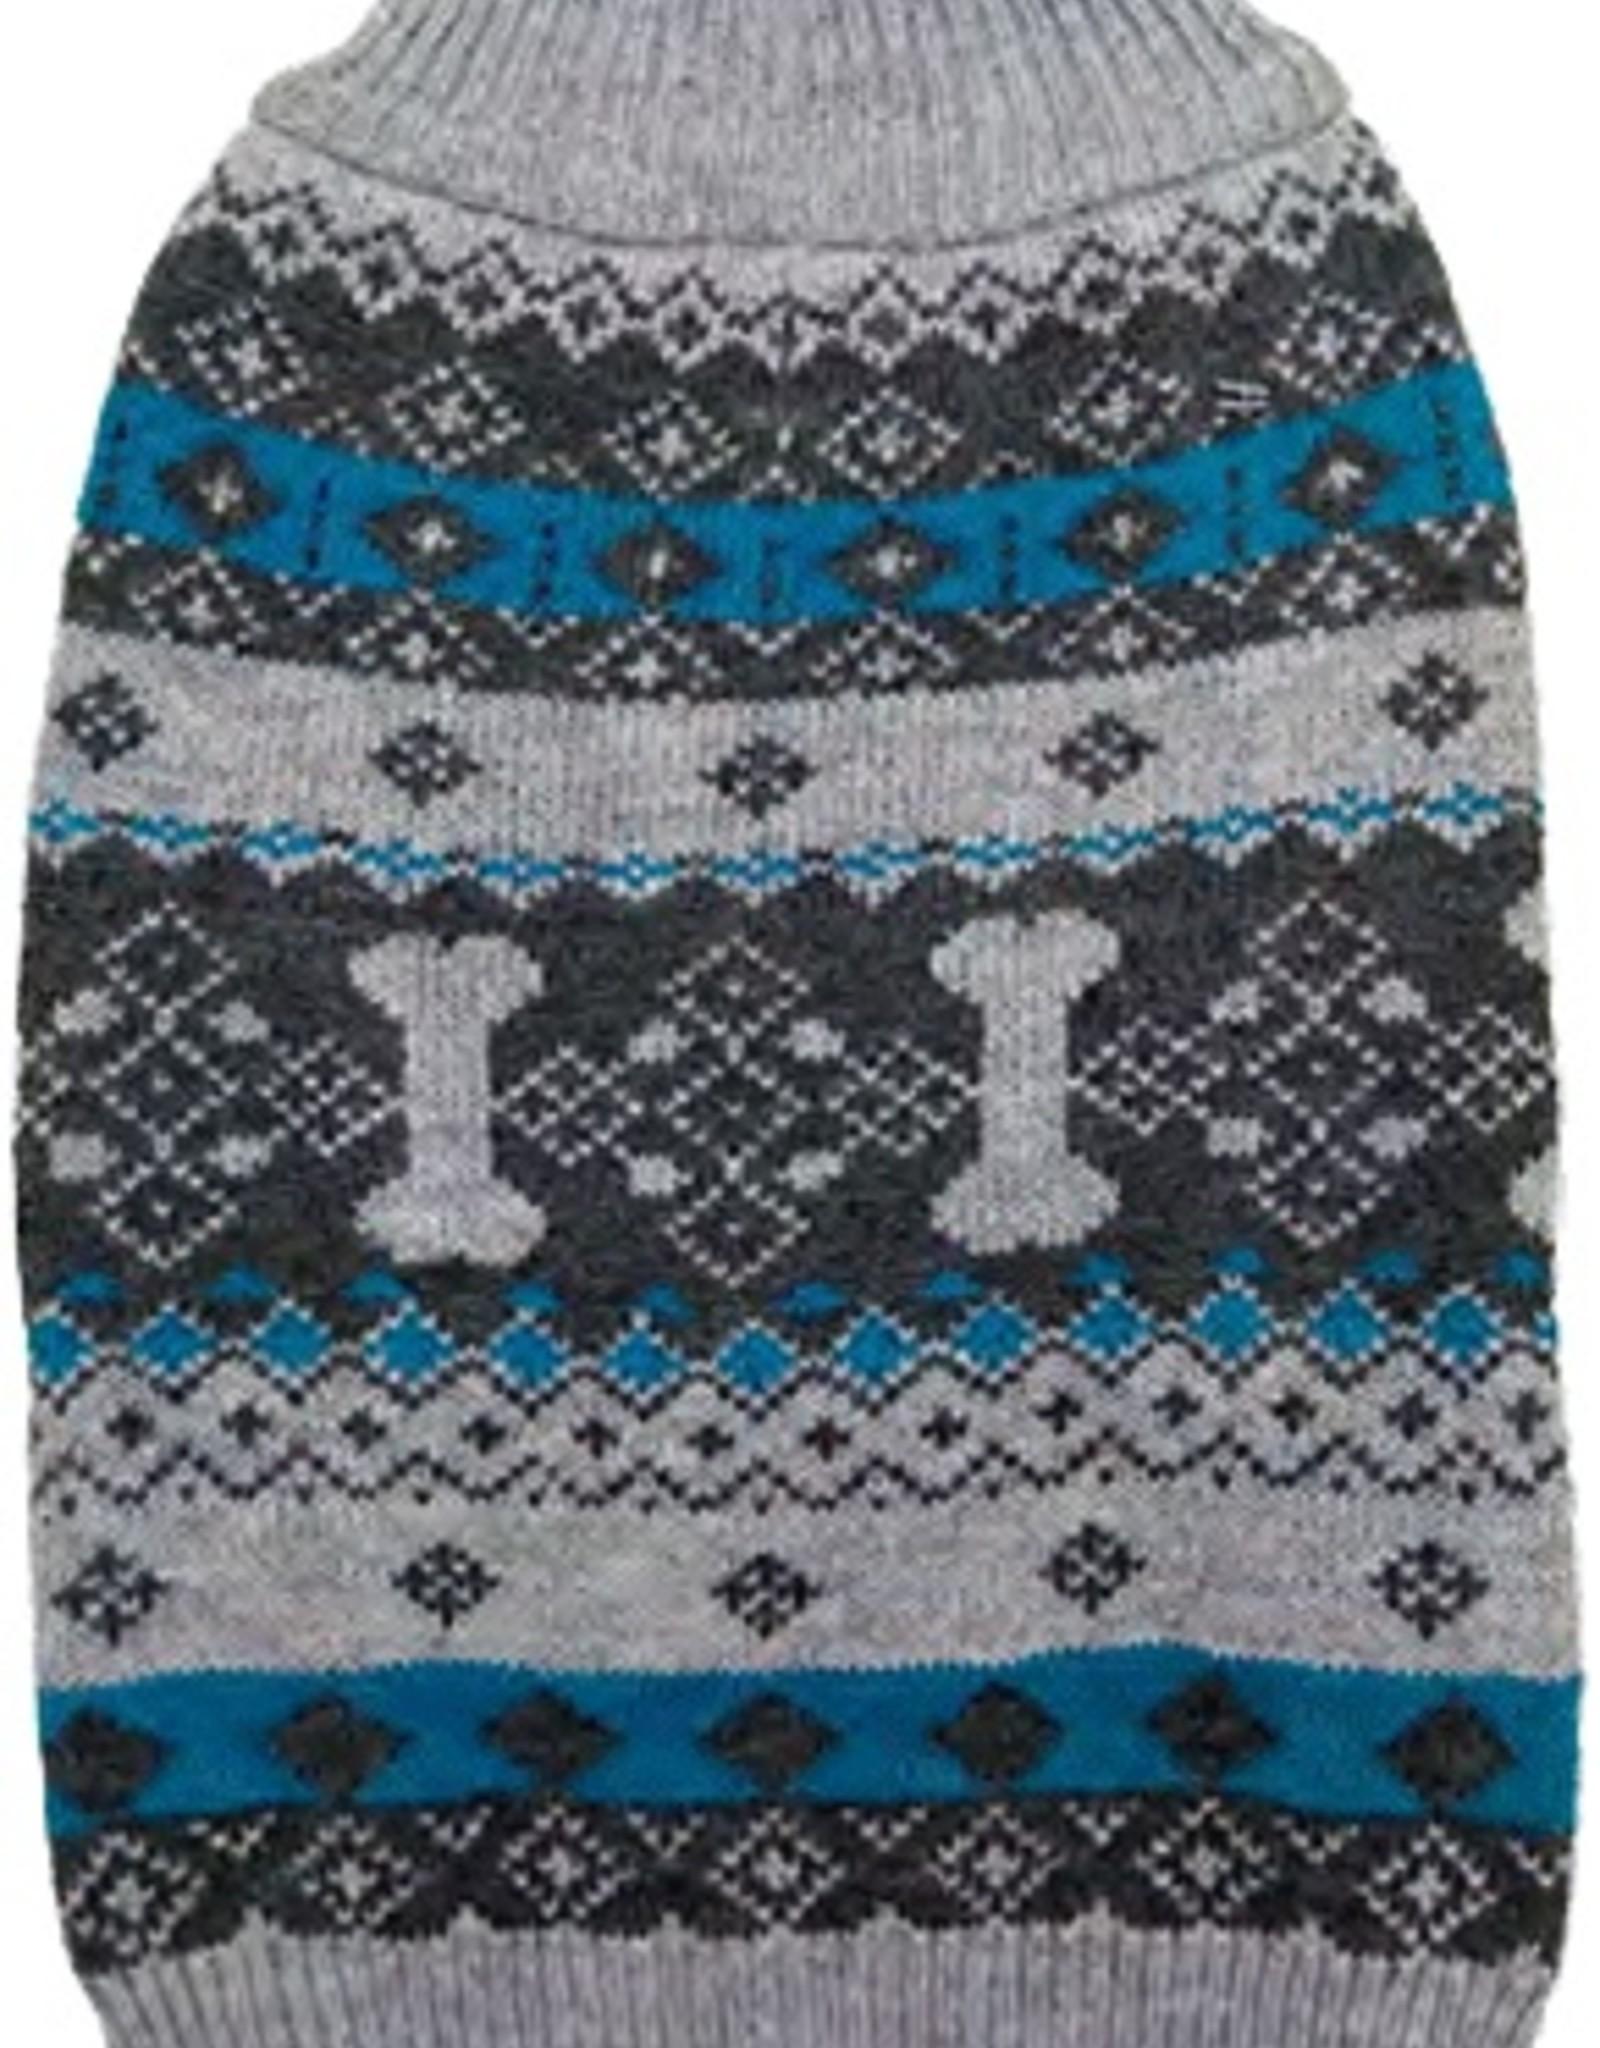 Fashion Pet - Nordic Knit Sweater